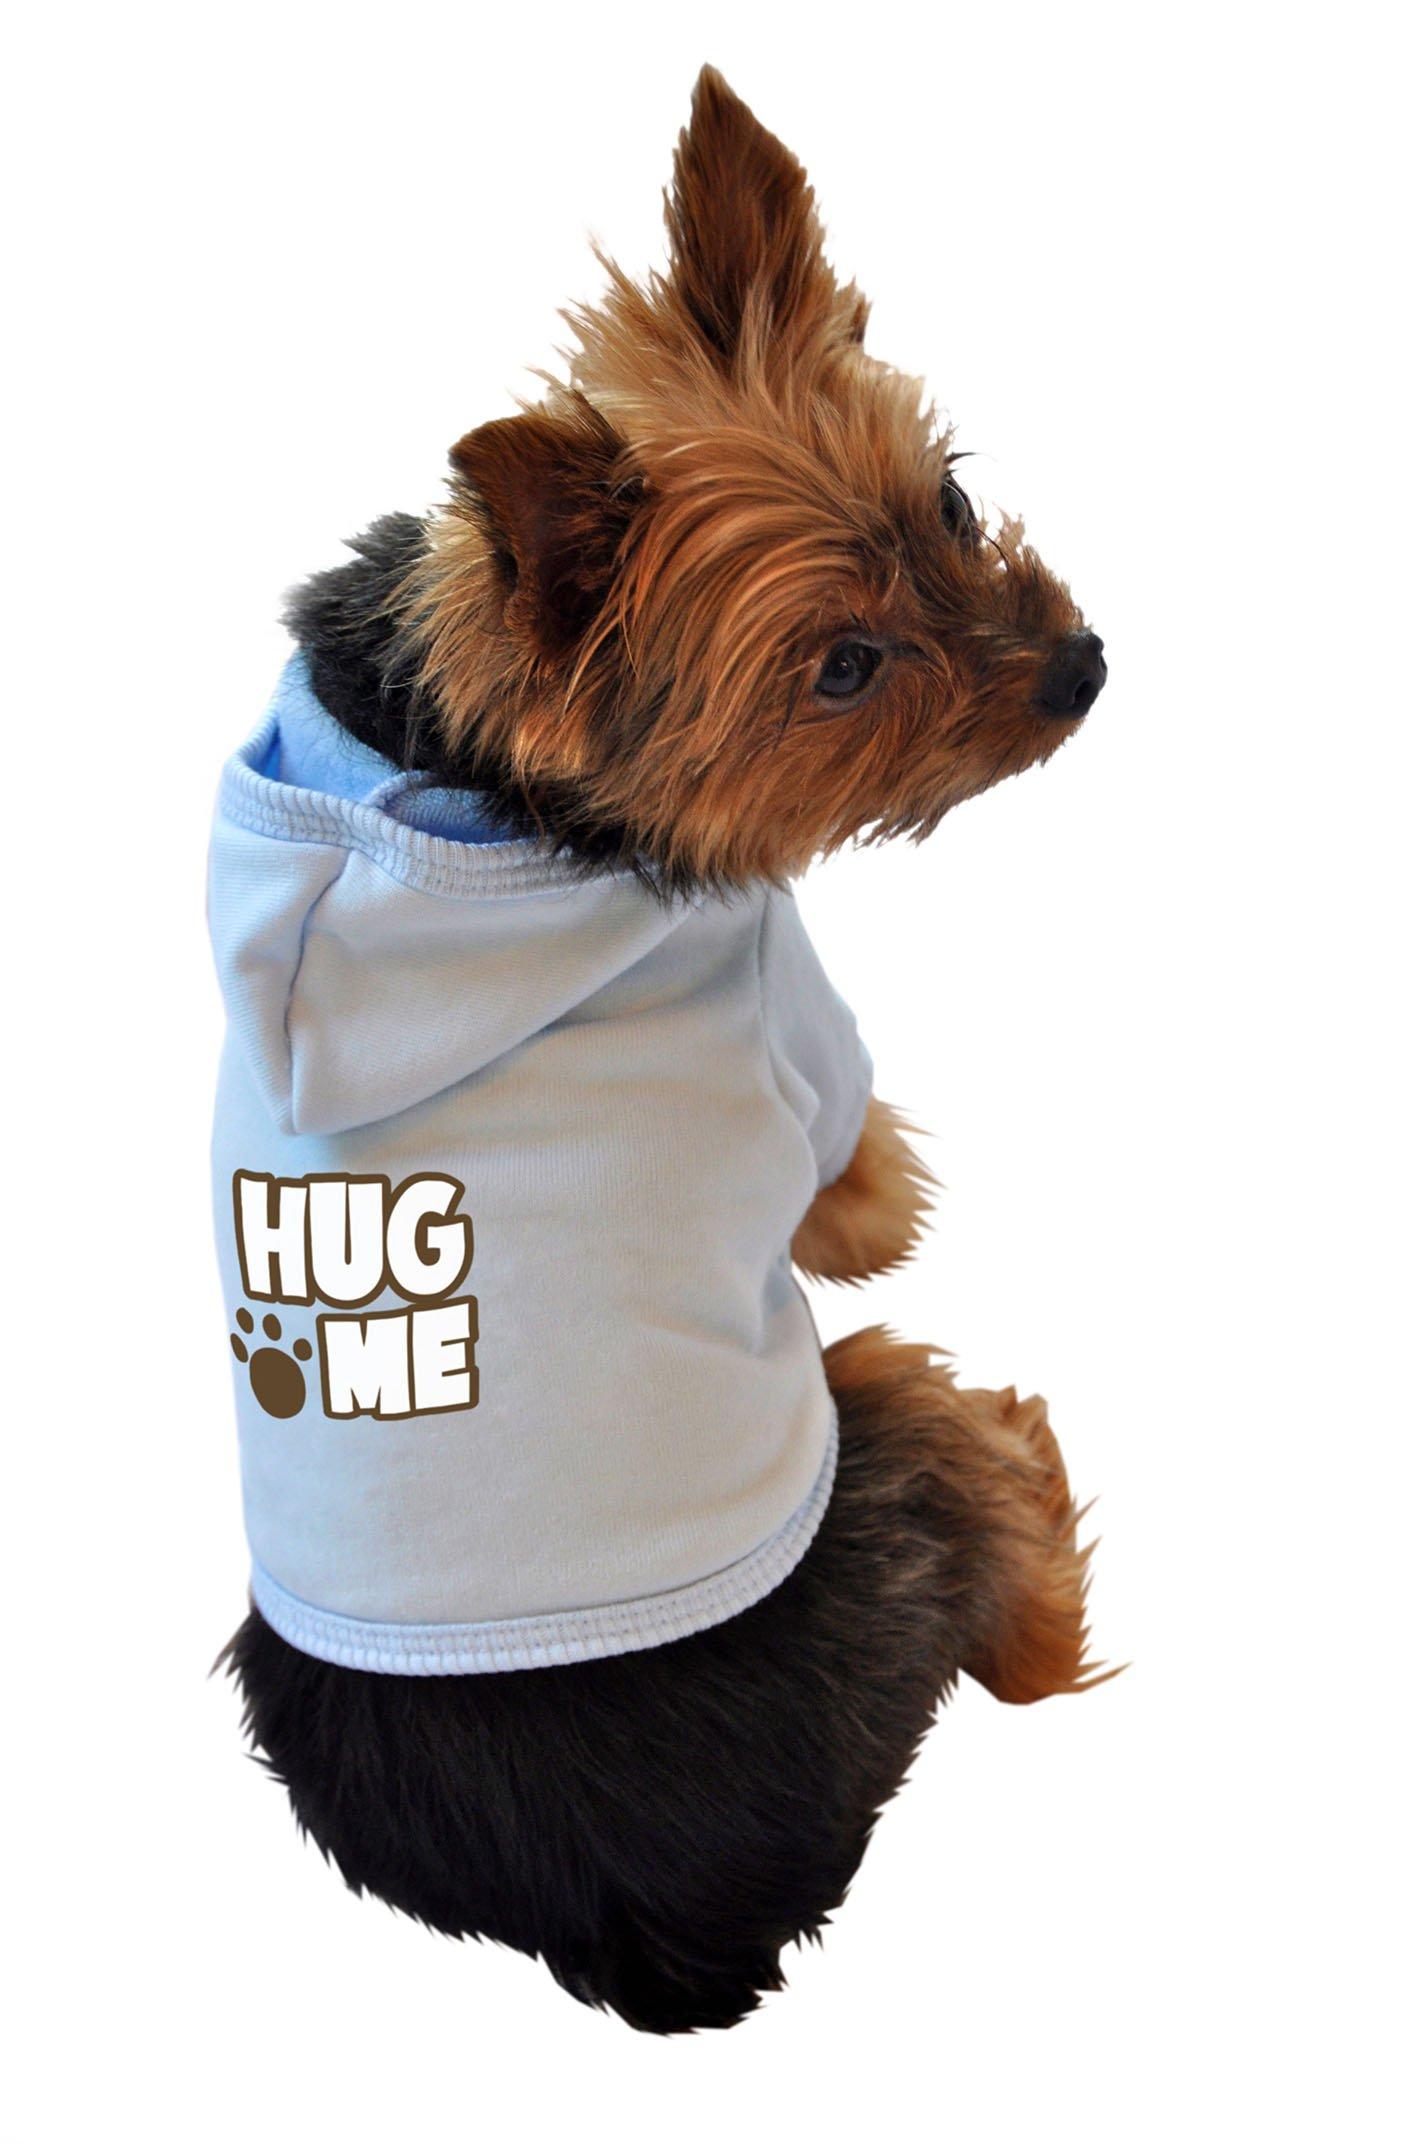 Ruff Ruff and Meow Dog Hoodie, Hug Me, Blue, Medium by Ruff Ruff and Meow